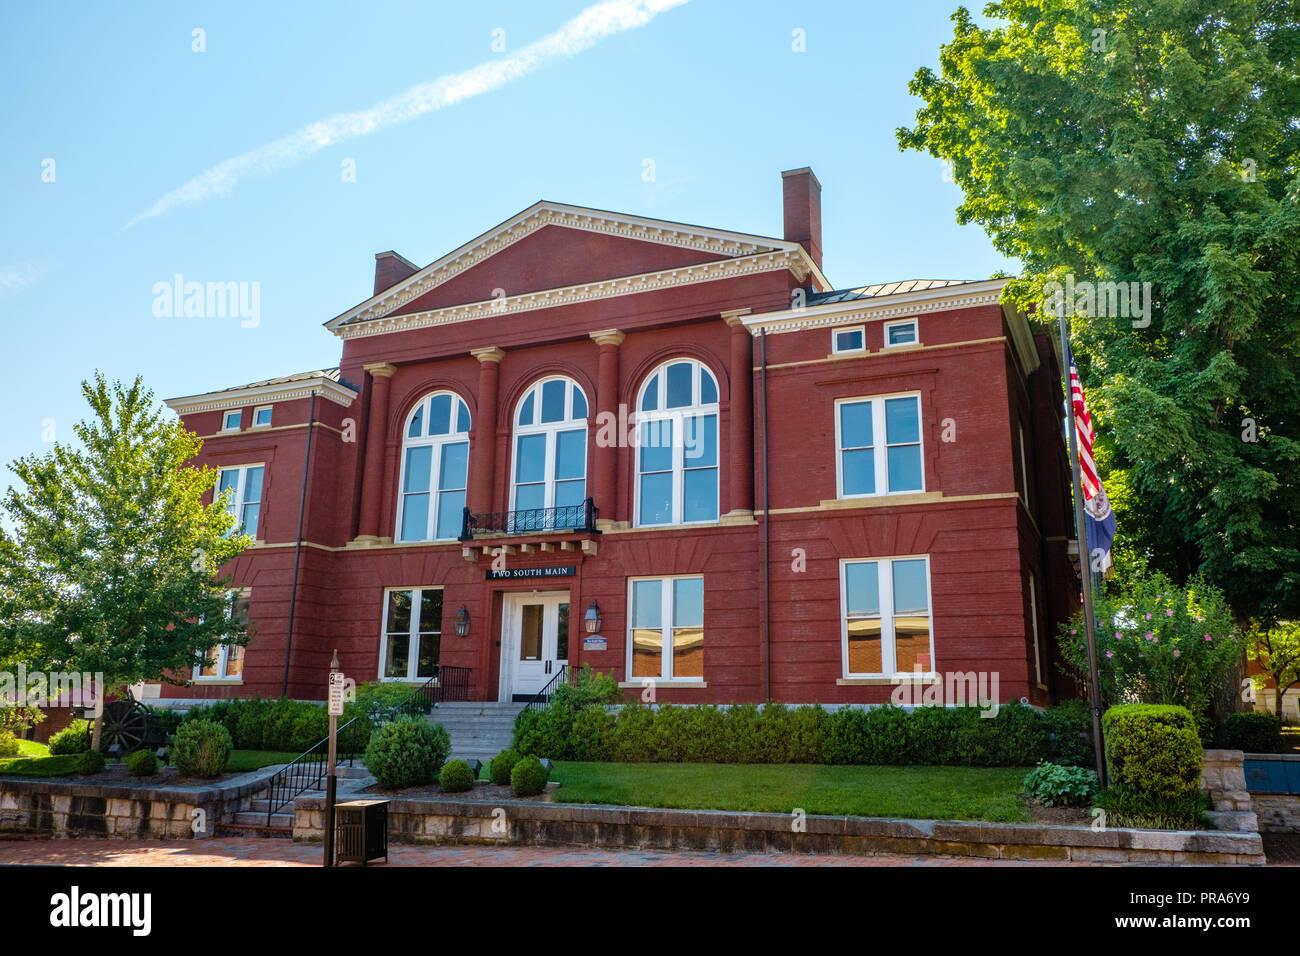 Old Rockbridge County Courthouse, 2 South Main Street, Lexington, Virginia - Stock Image